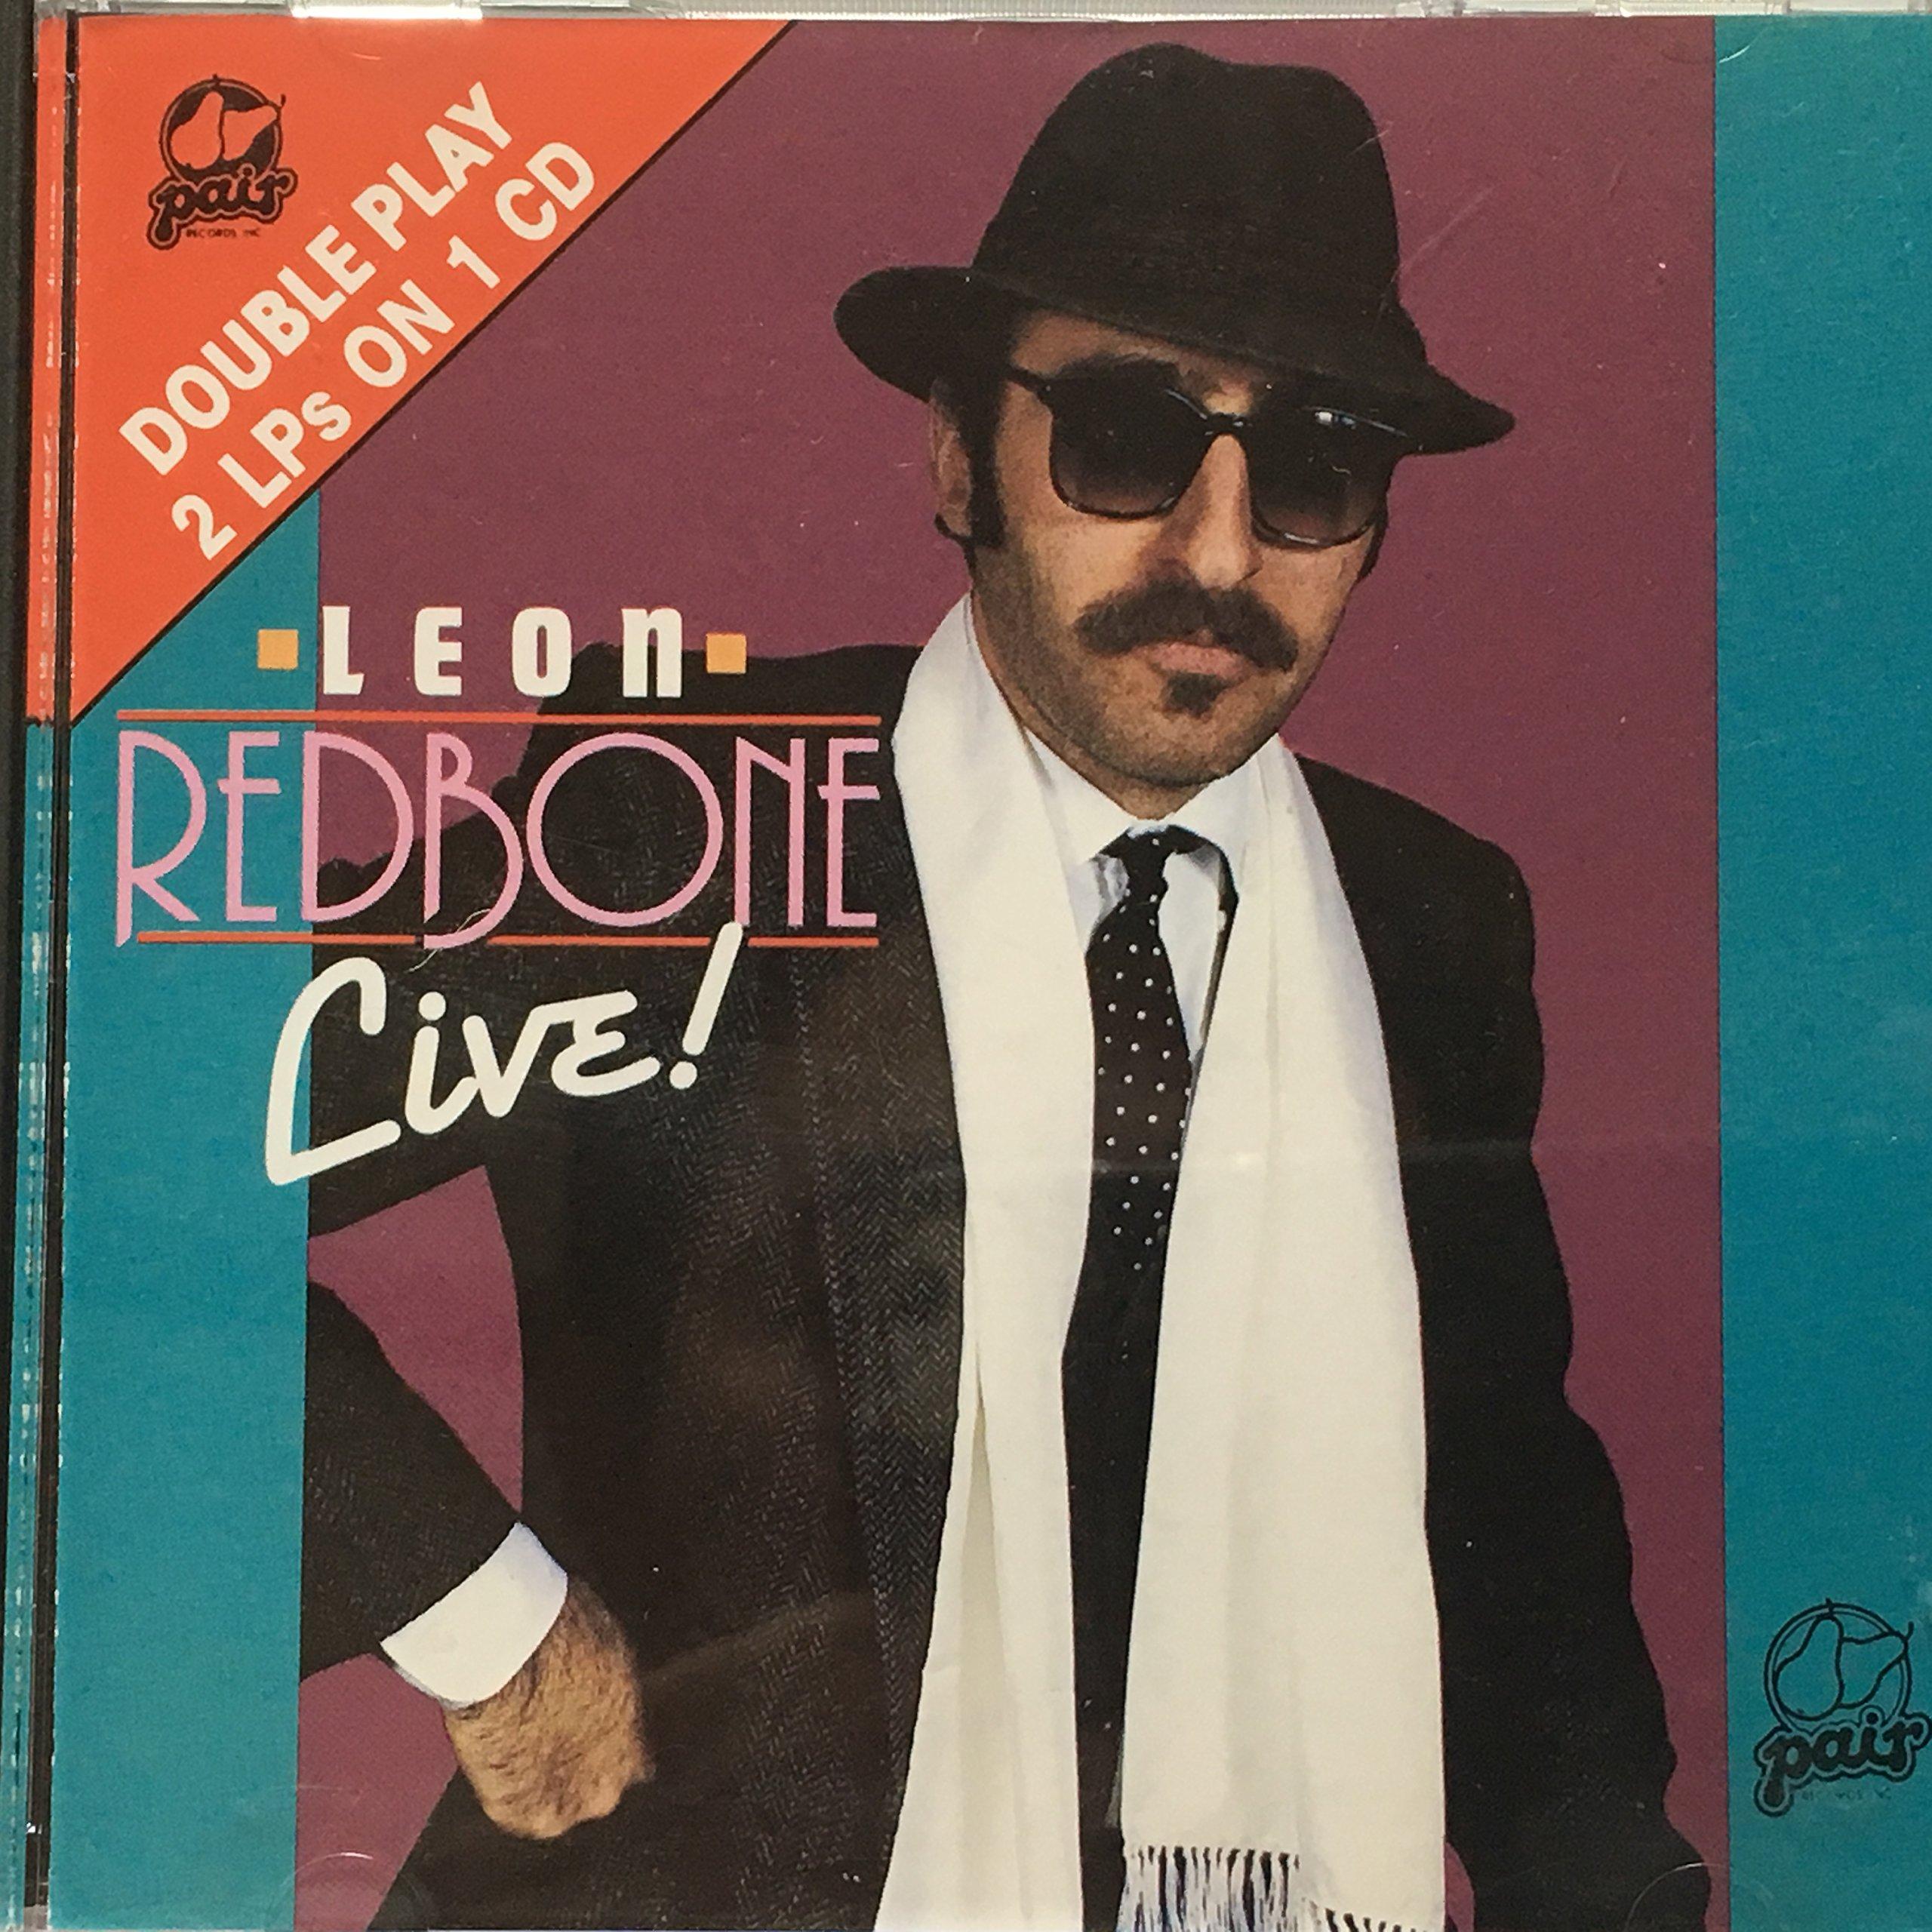 Leon Redbone Live! by Pair